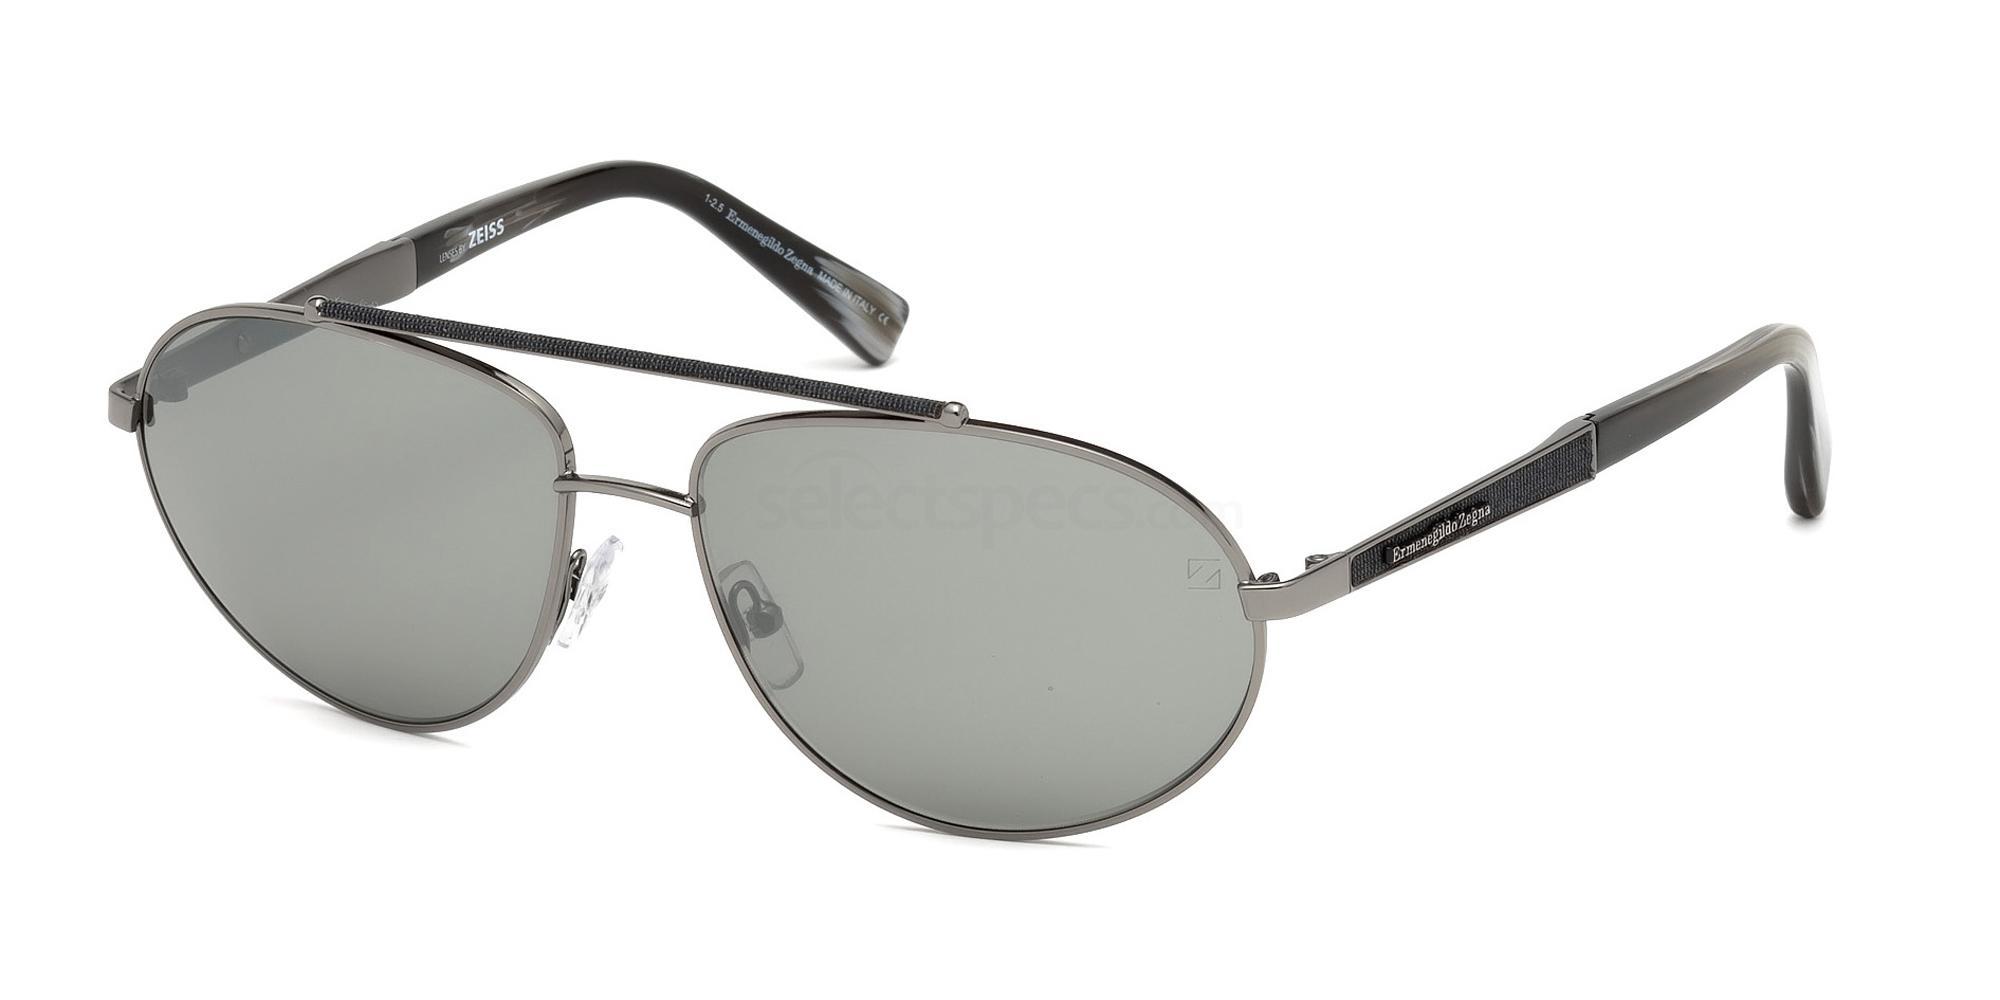 12C EZ0037 Sunglasses, Ermenegildo Zegna